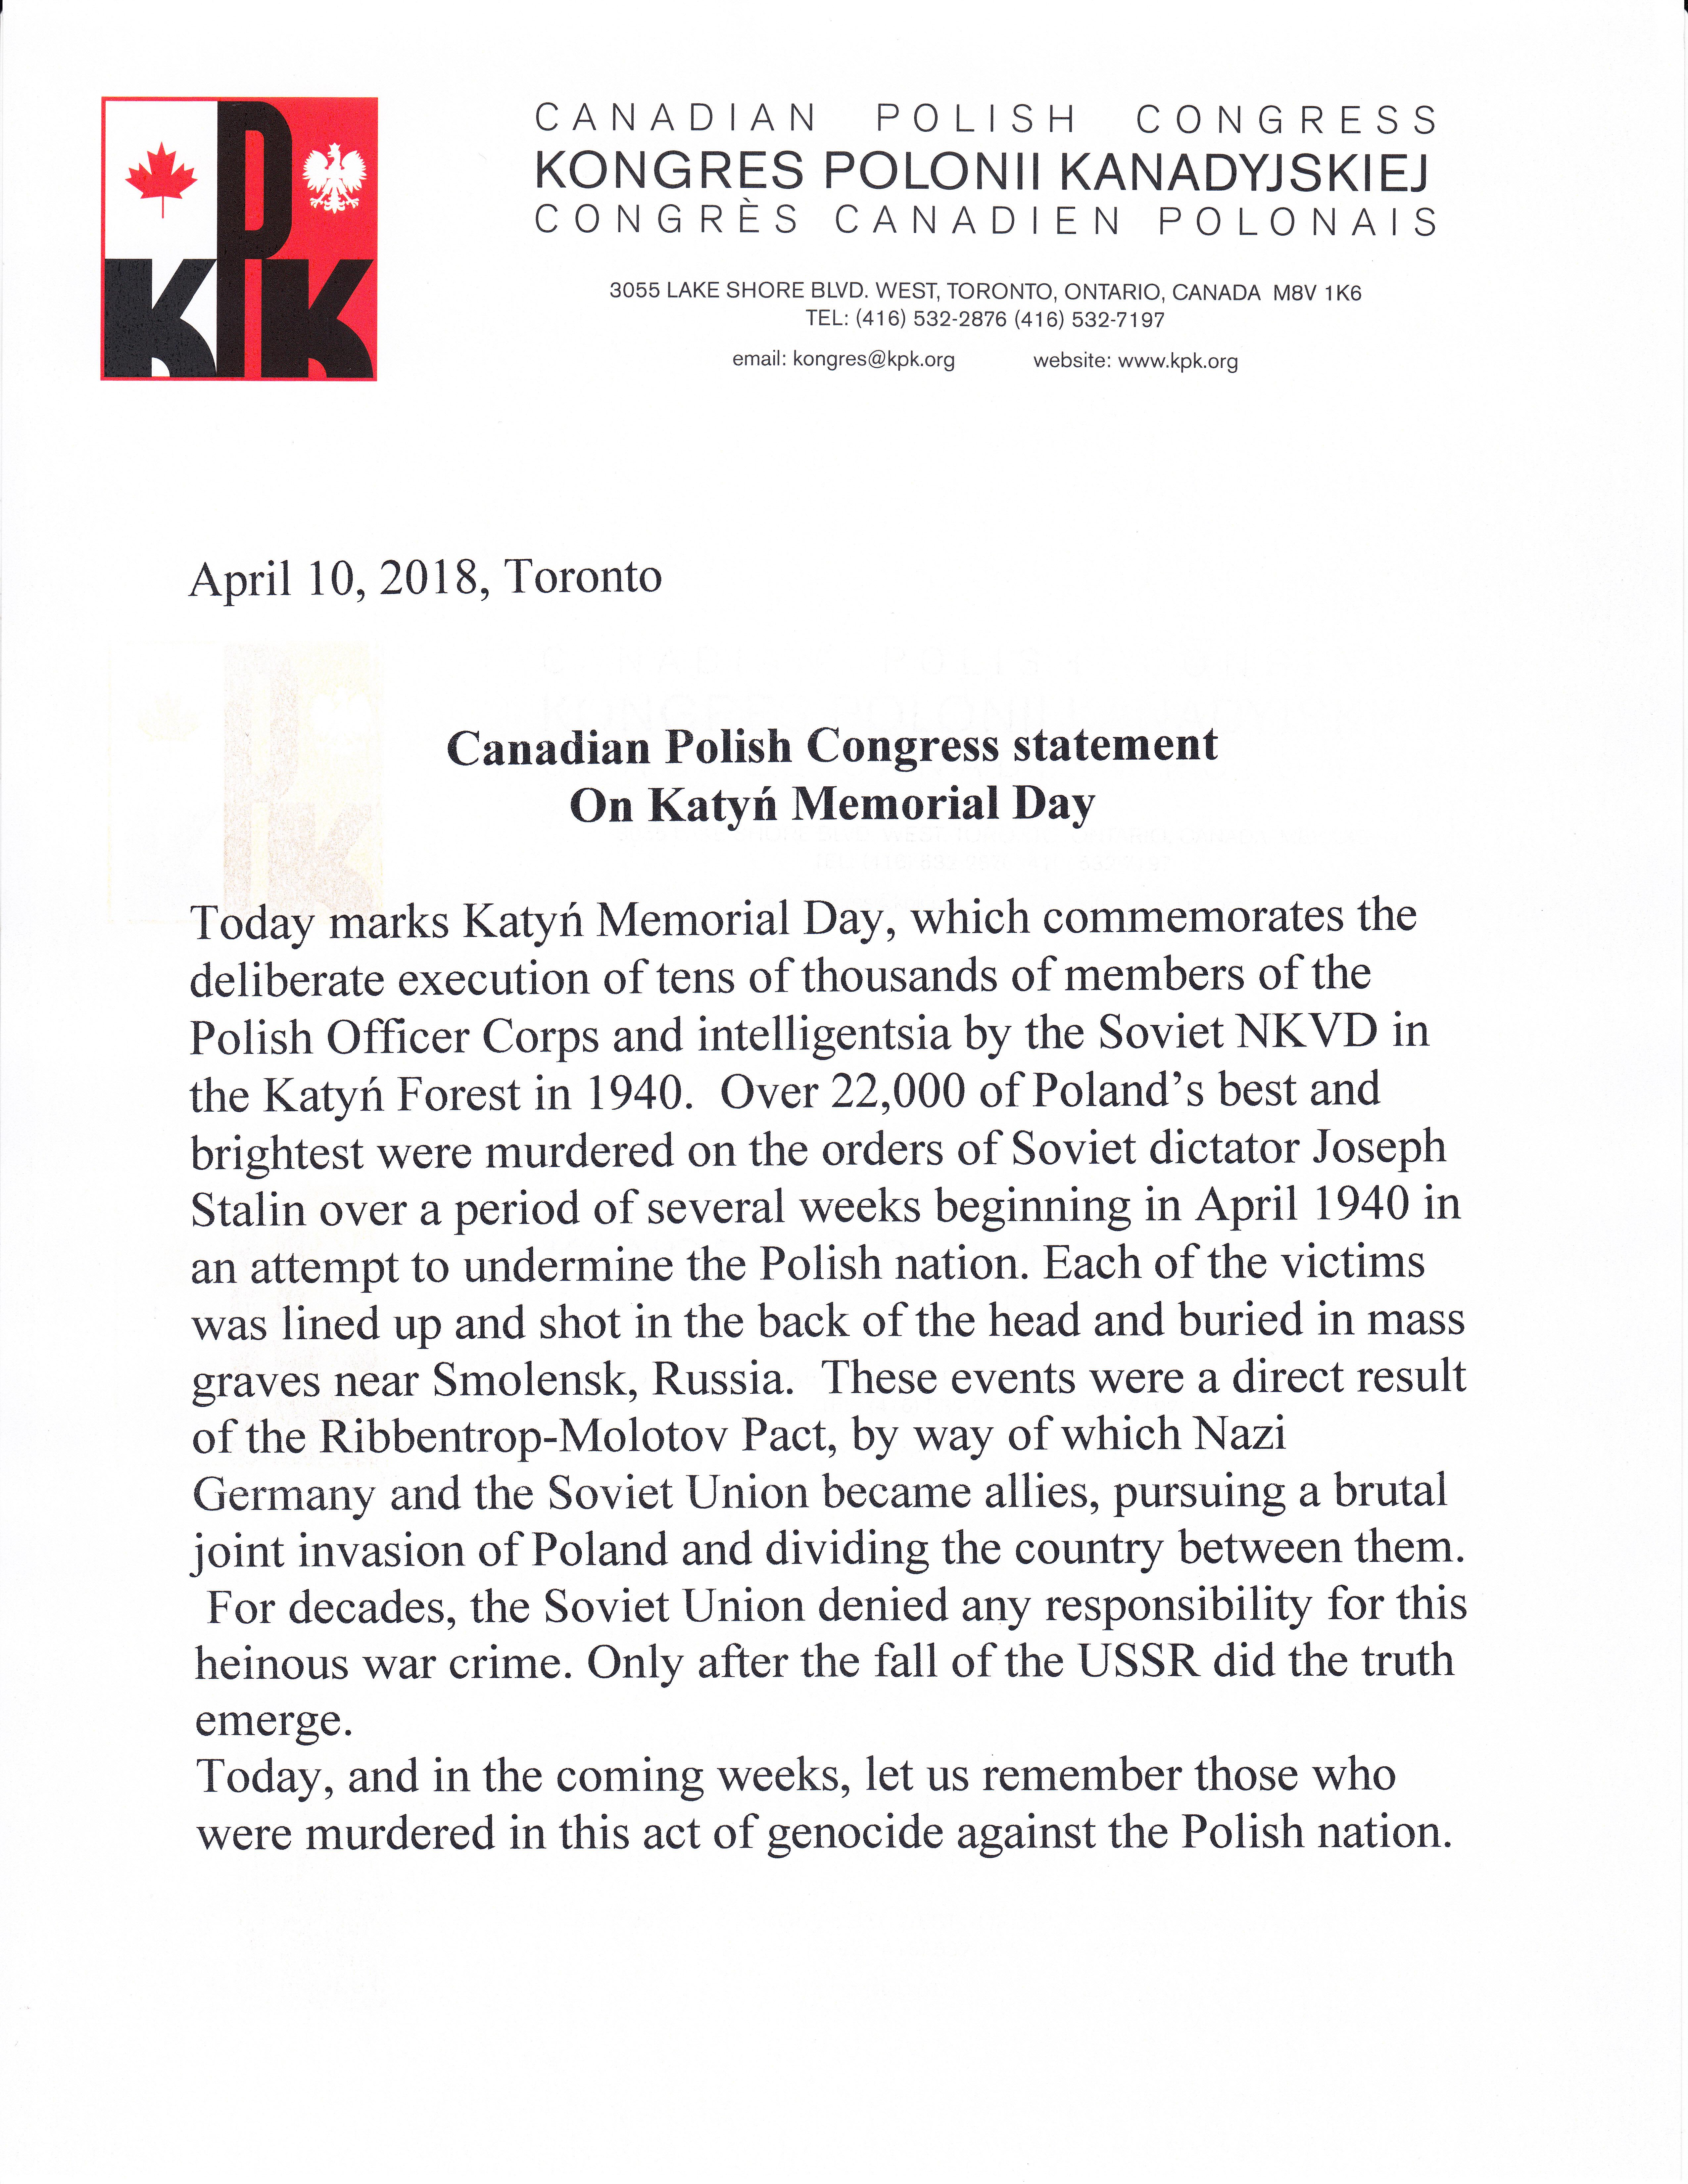 Katyn – Canadian Polish Congress Statement